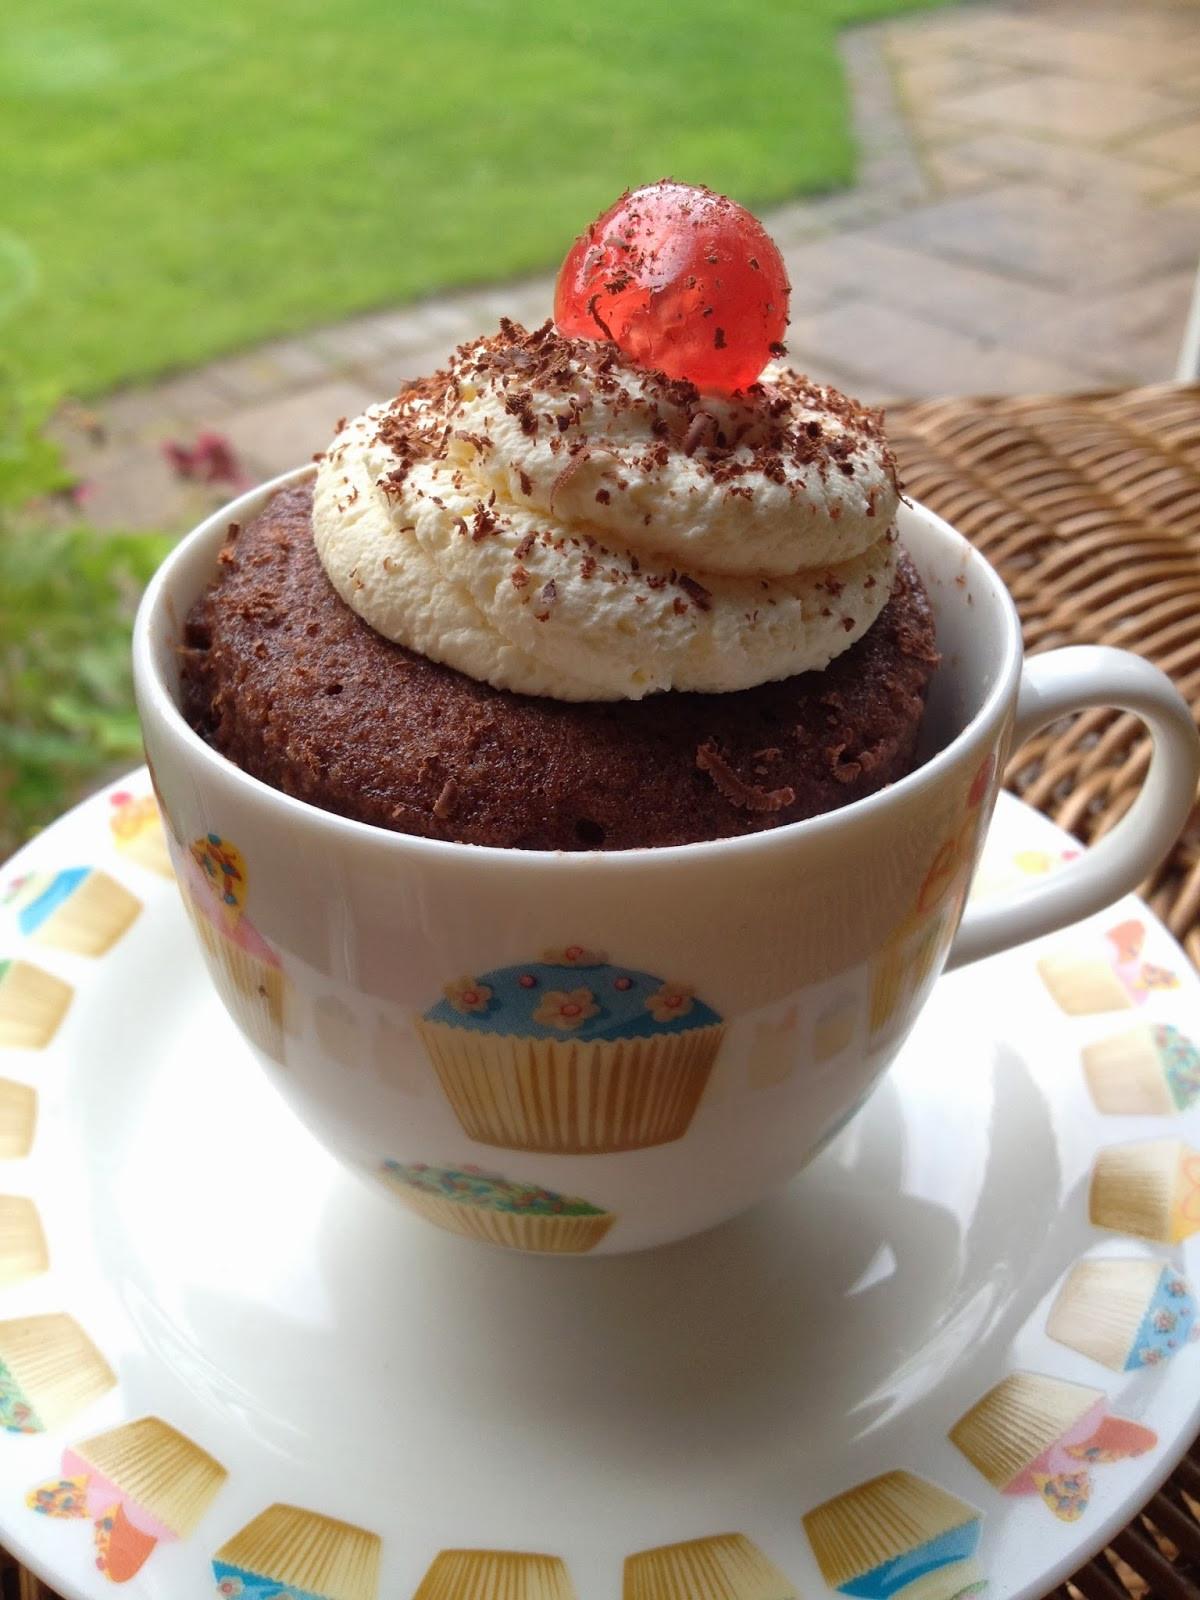 Cake In A Mug Recipe  Cake in a Mug recipe